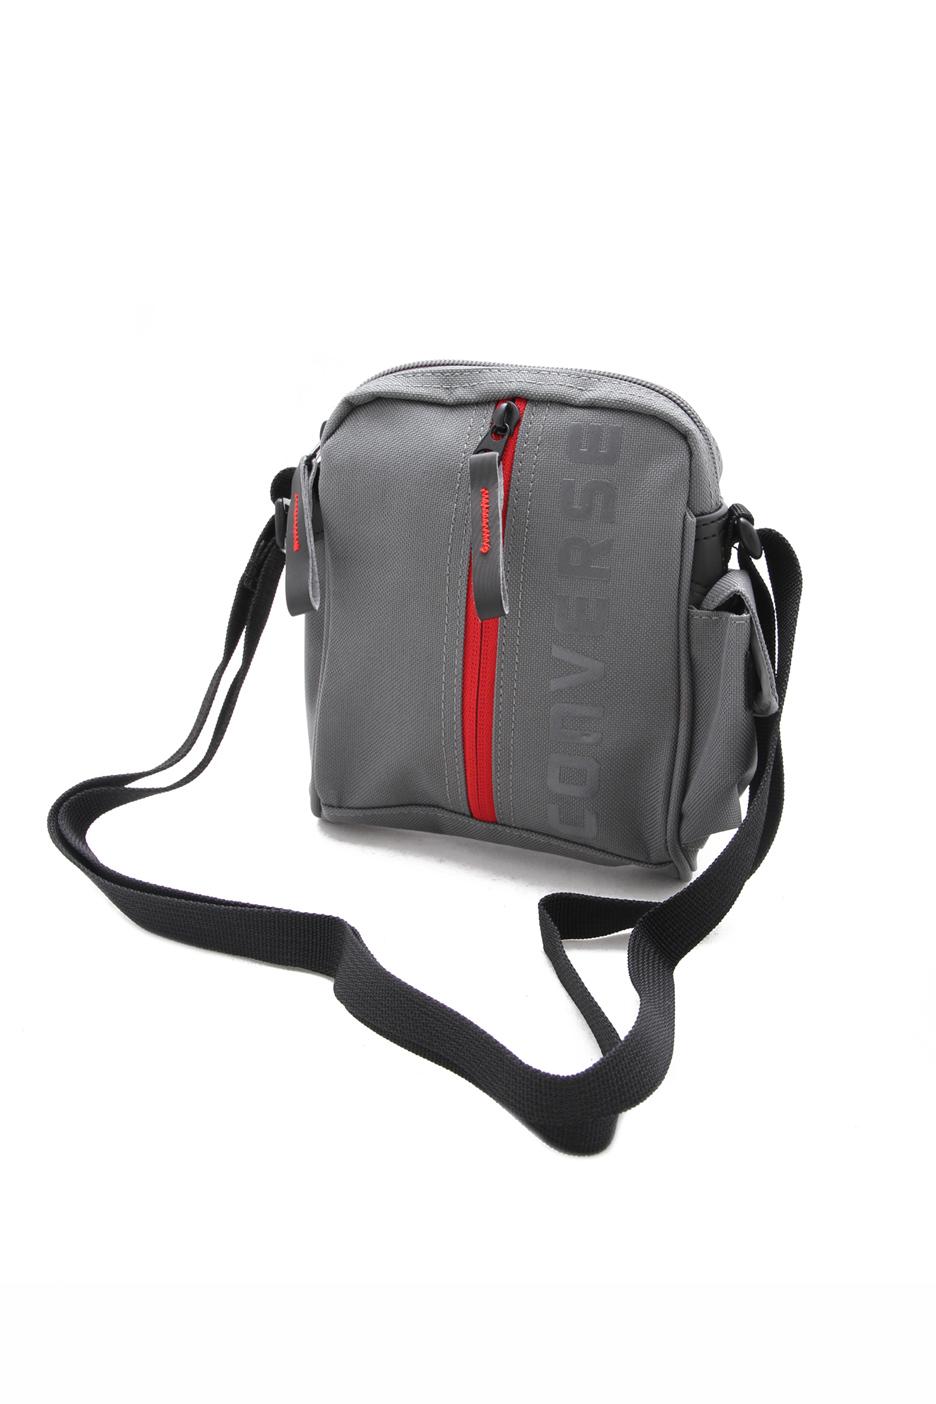 Converse - N-Trainner Grey - Bag - Impericon.com UK 5d2cbd4480